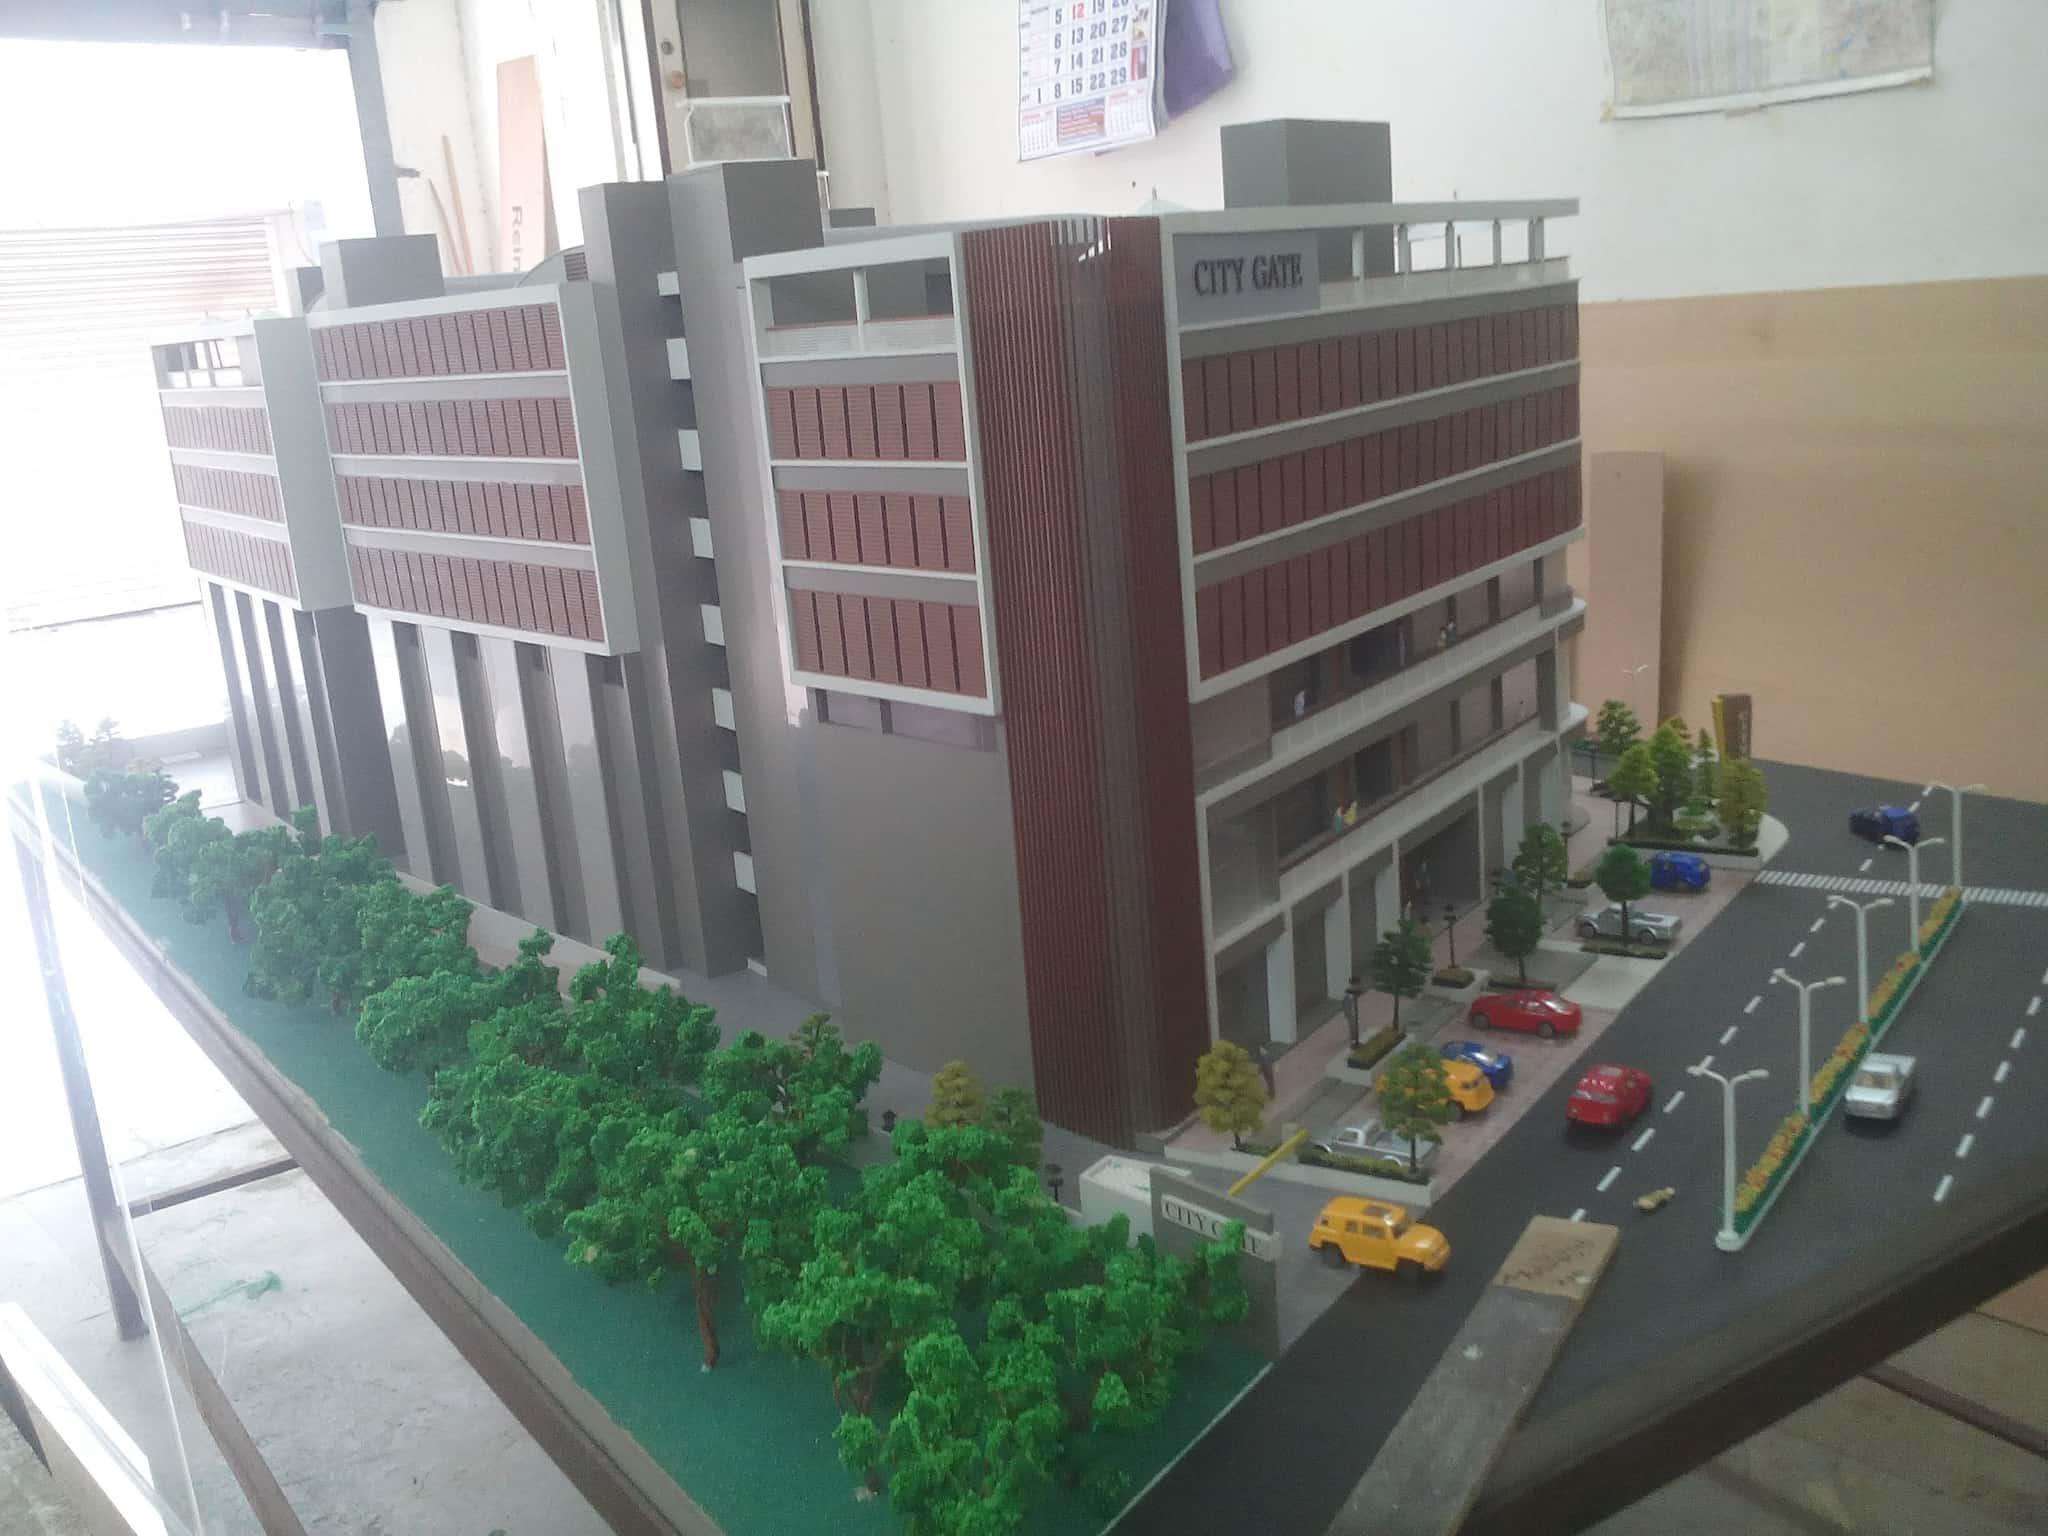 Klassic Architectural Model Maker, Chandlodiya - Architects